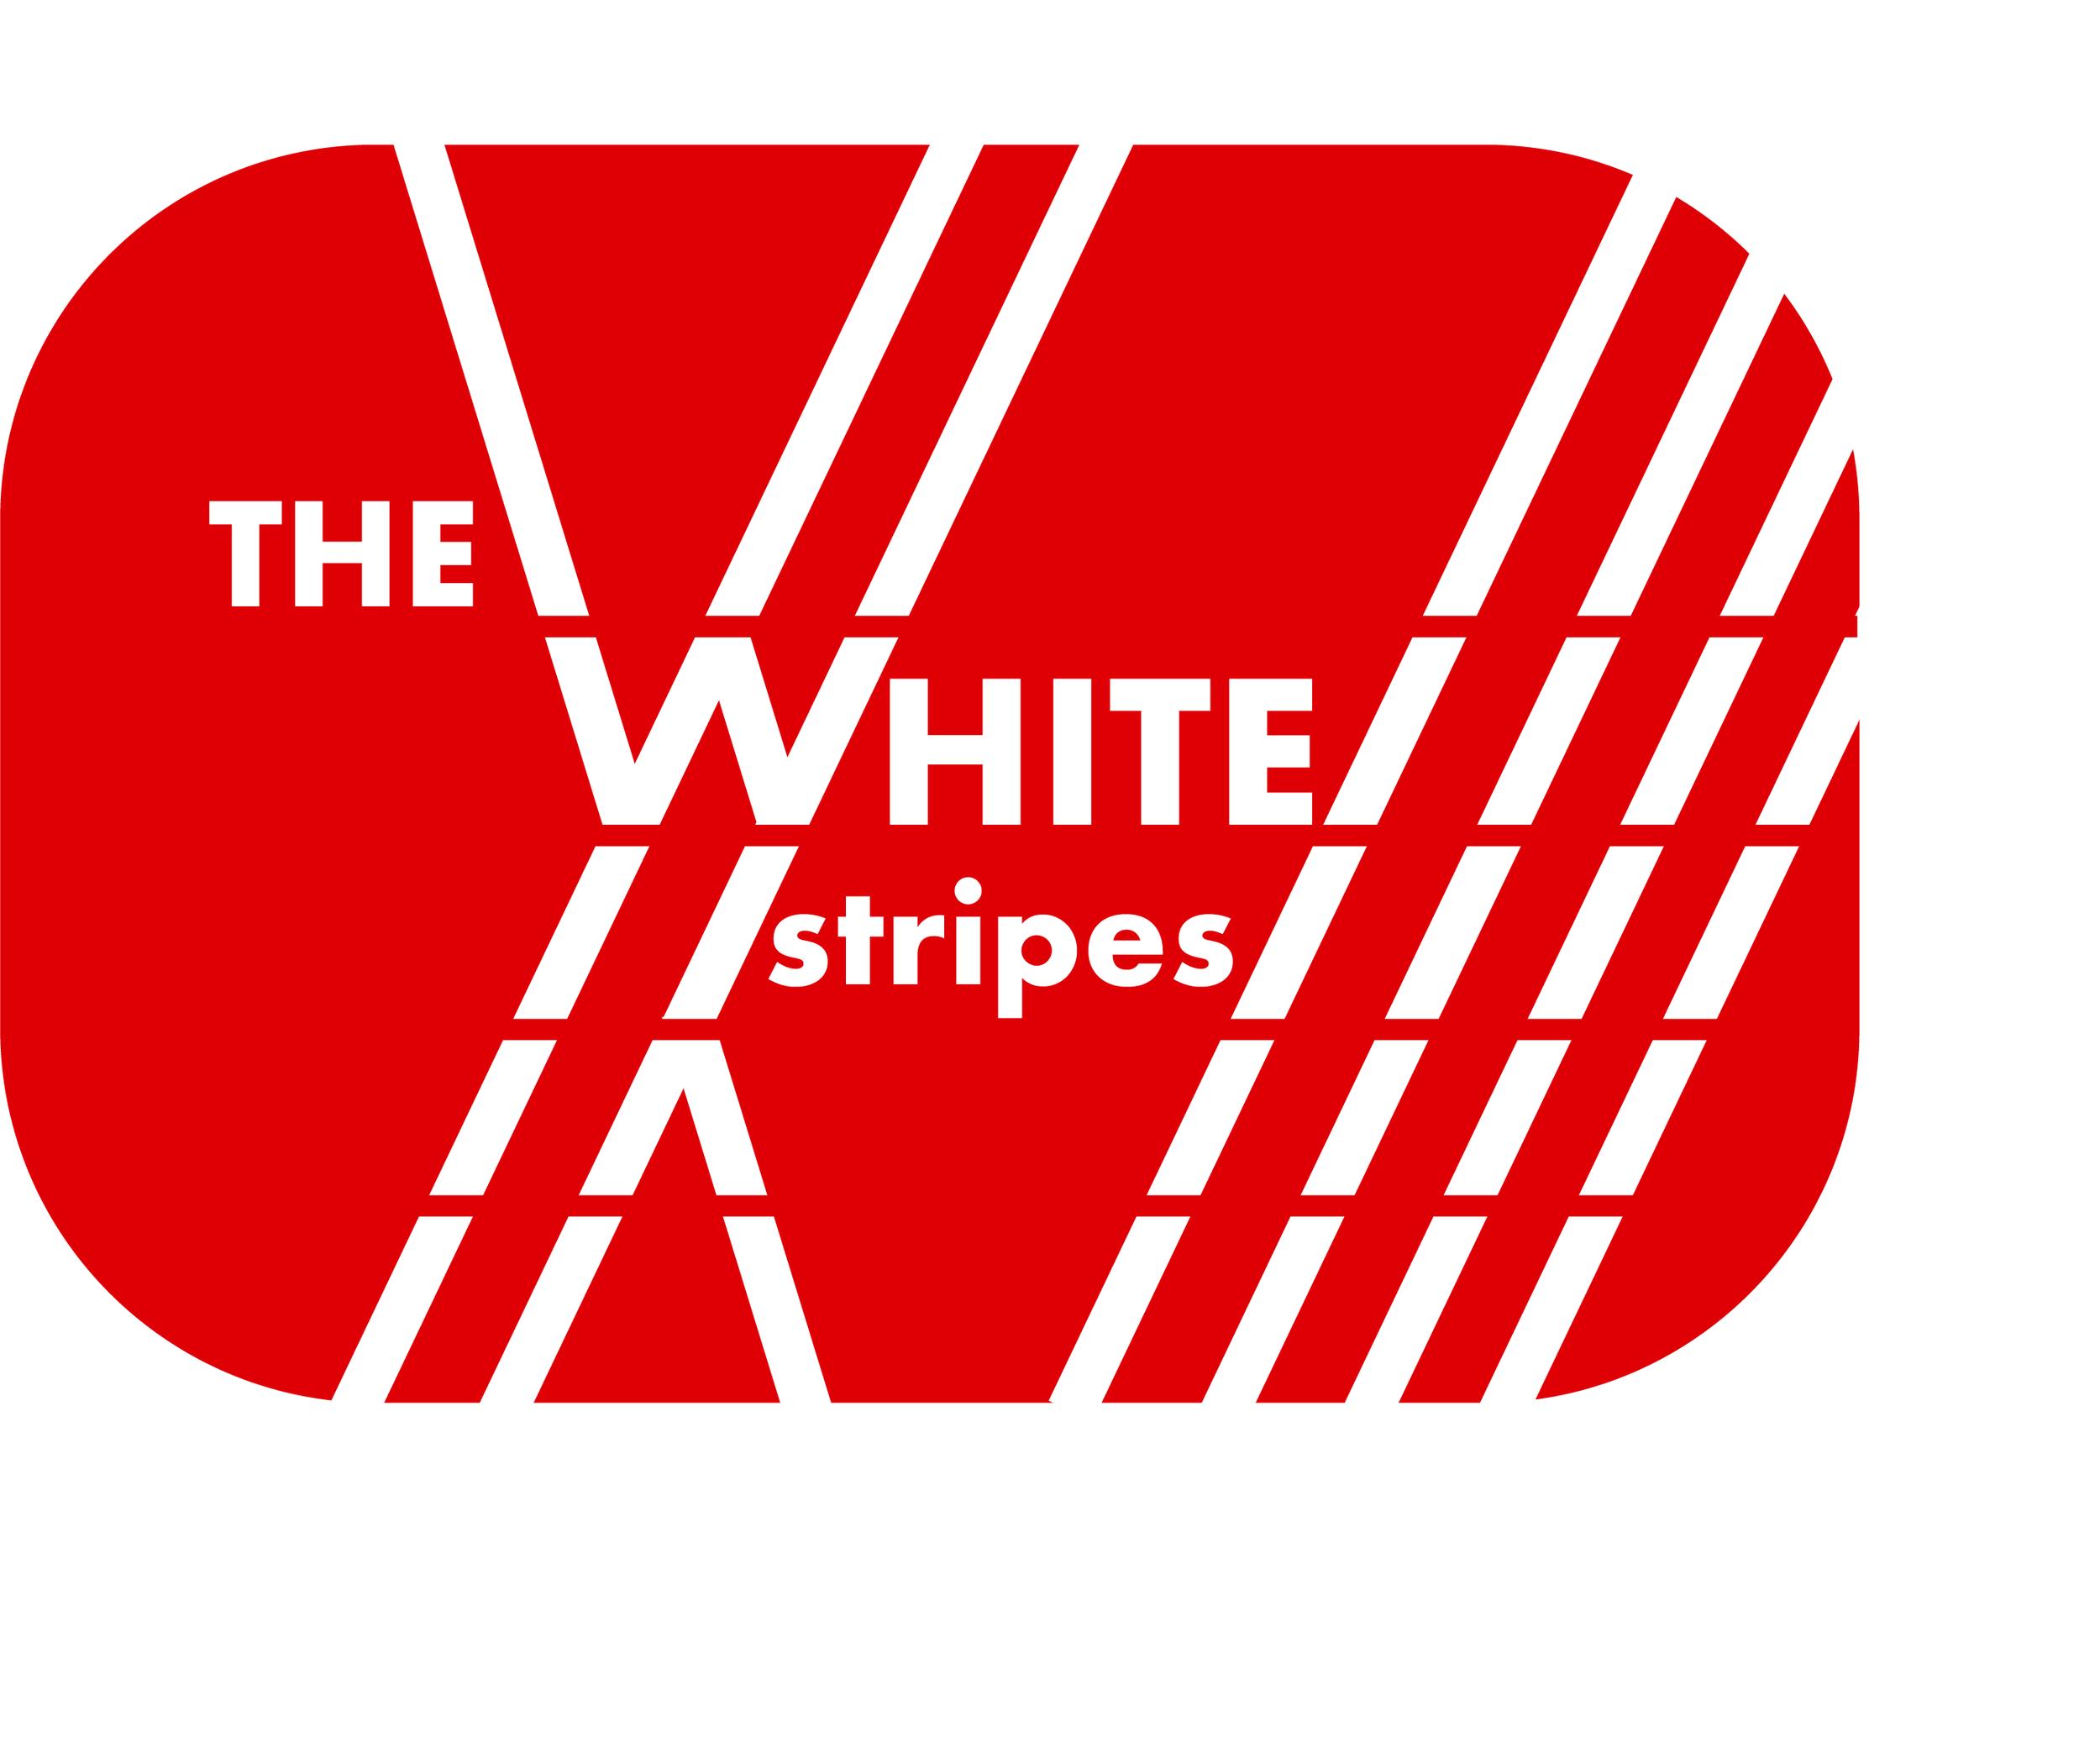 whitestripes.png